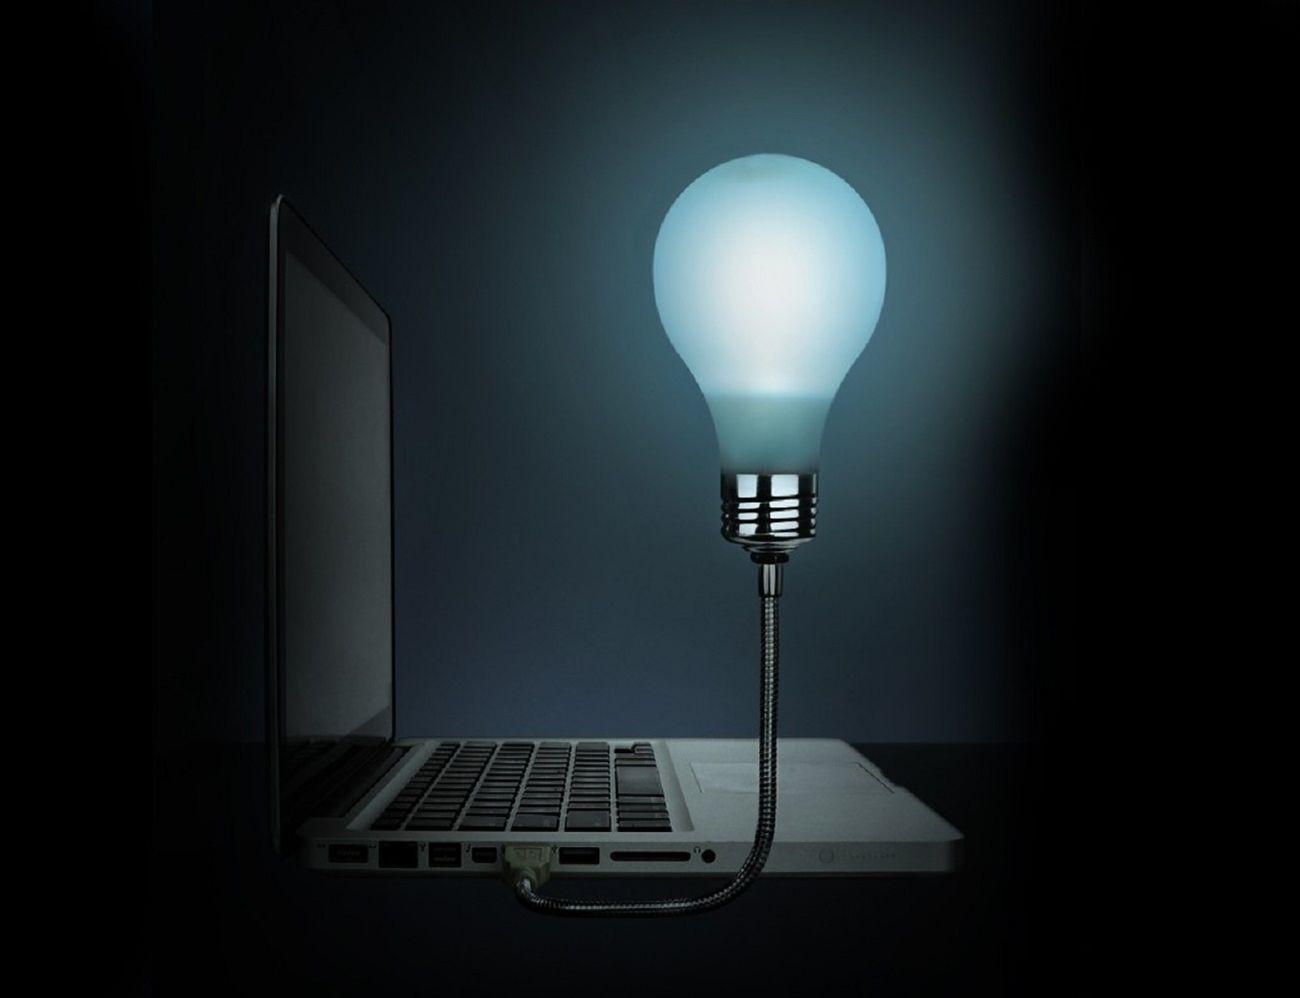 Bright+Idea+USB+Laptop+Light